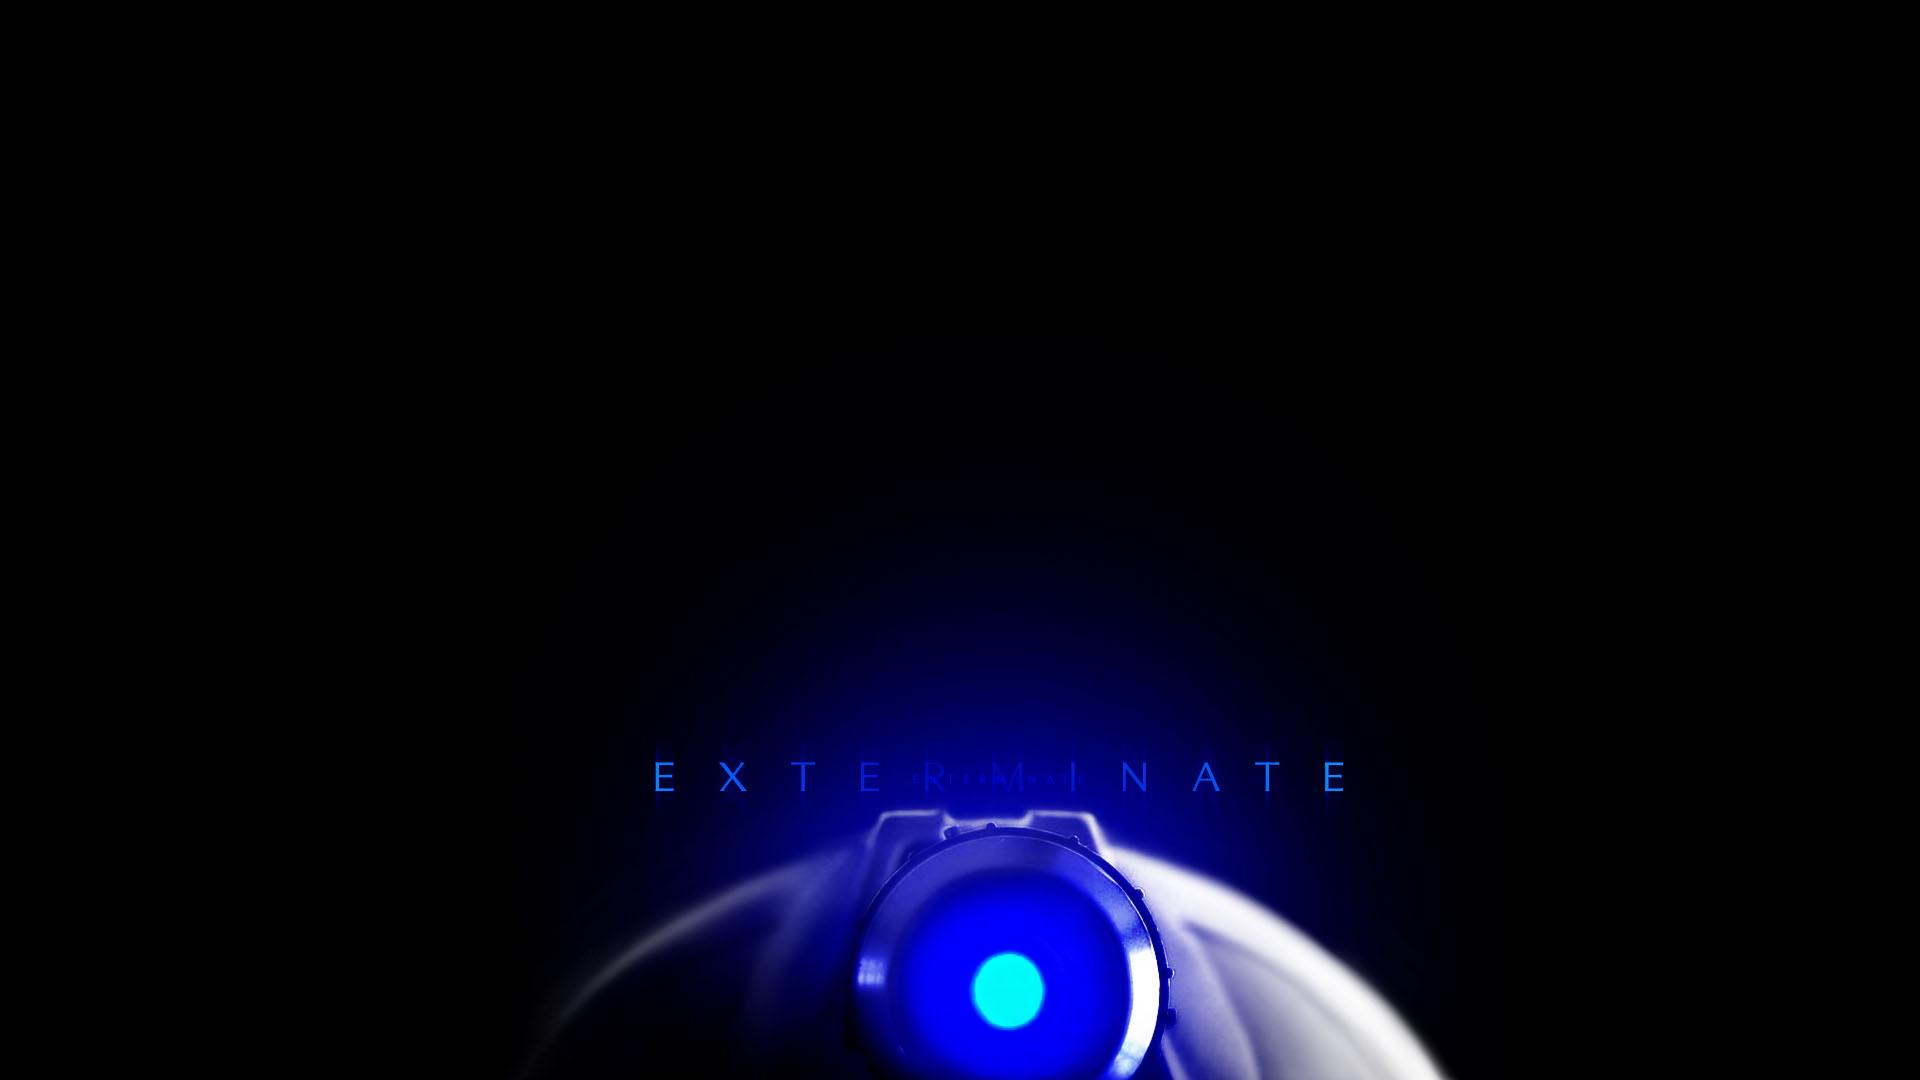 Doctor Who Wallpaper Dalek Exterminate Doctor Who Desktop Wal...